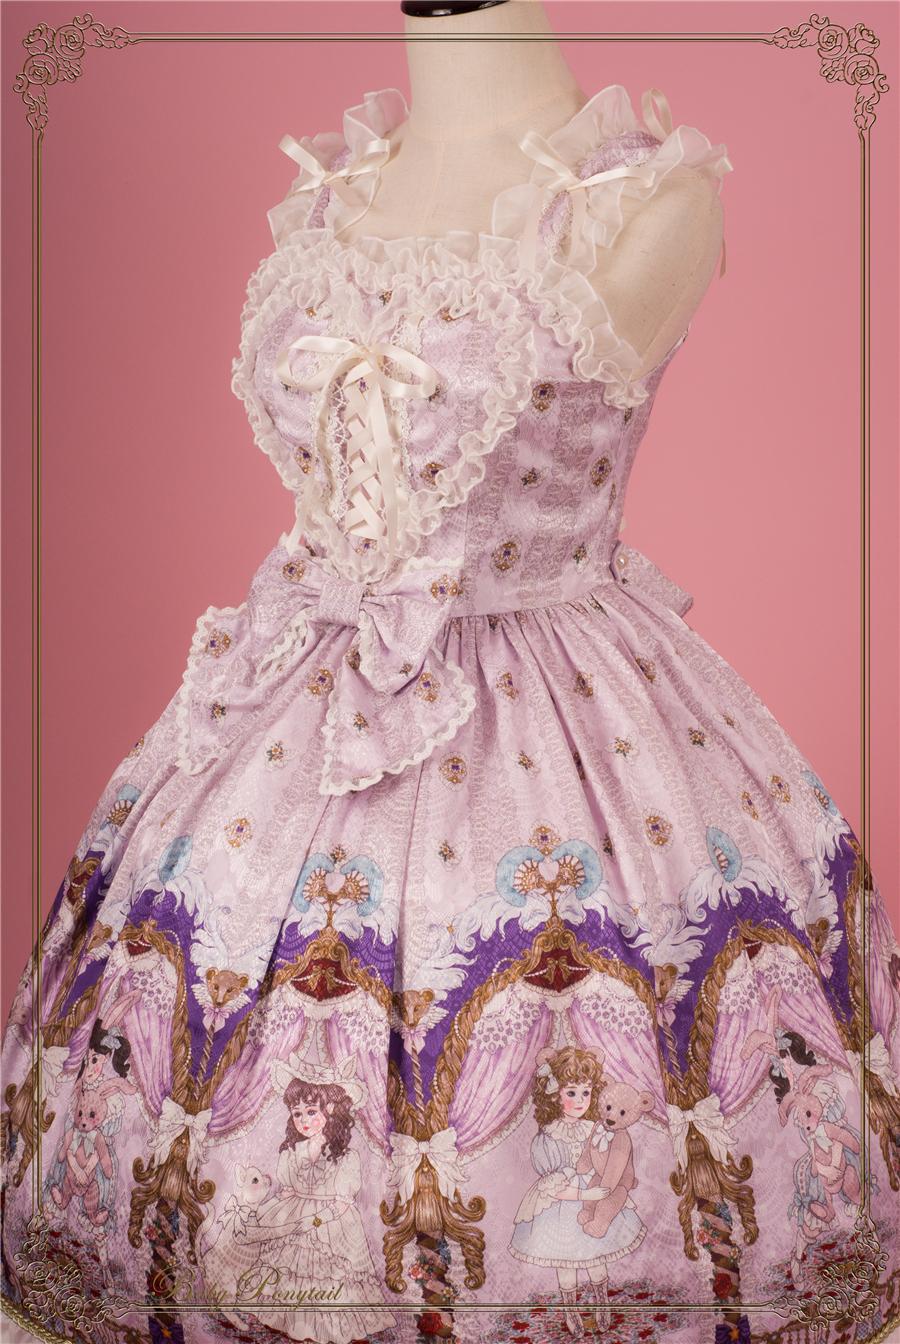 BabyPonytail_Stock Photo_My Favorite Companion_JSK Lavender_6.jpg